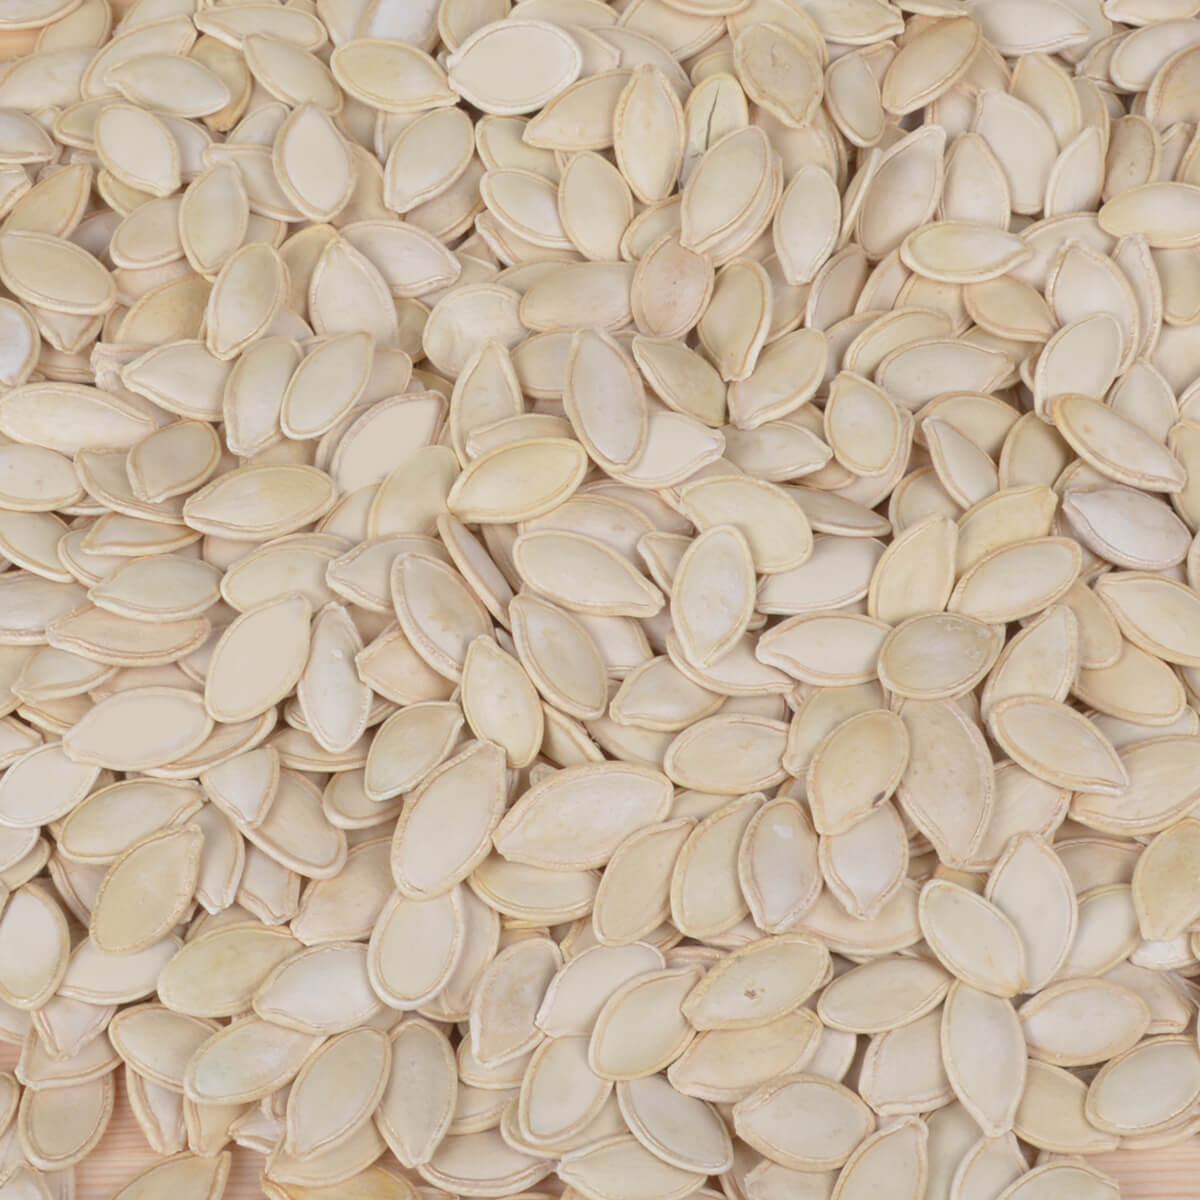 nevsehir-pumpkin-seed-25